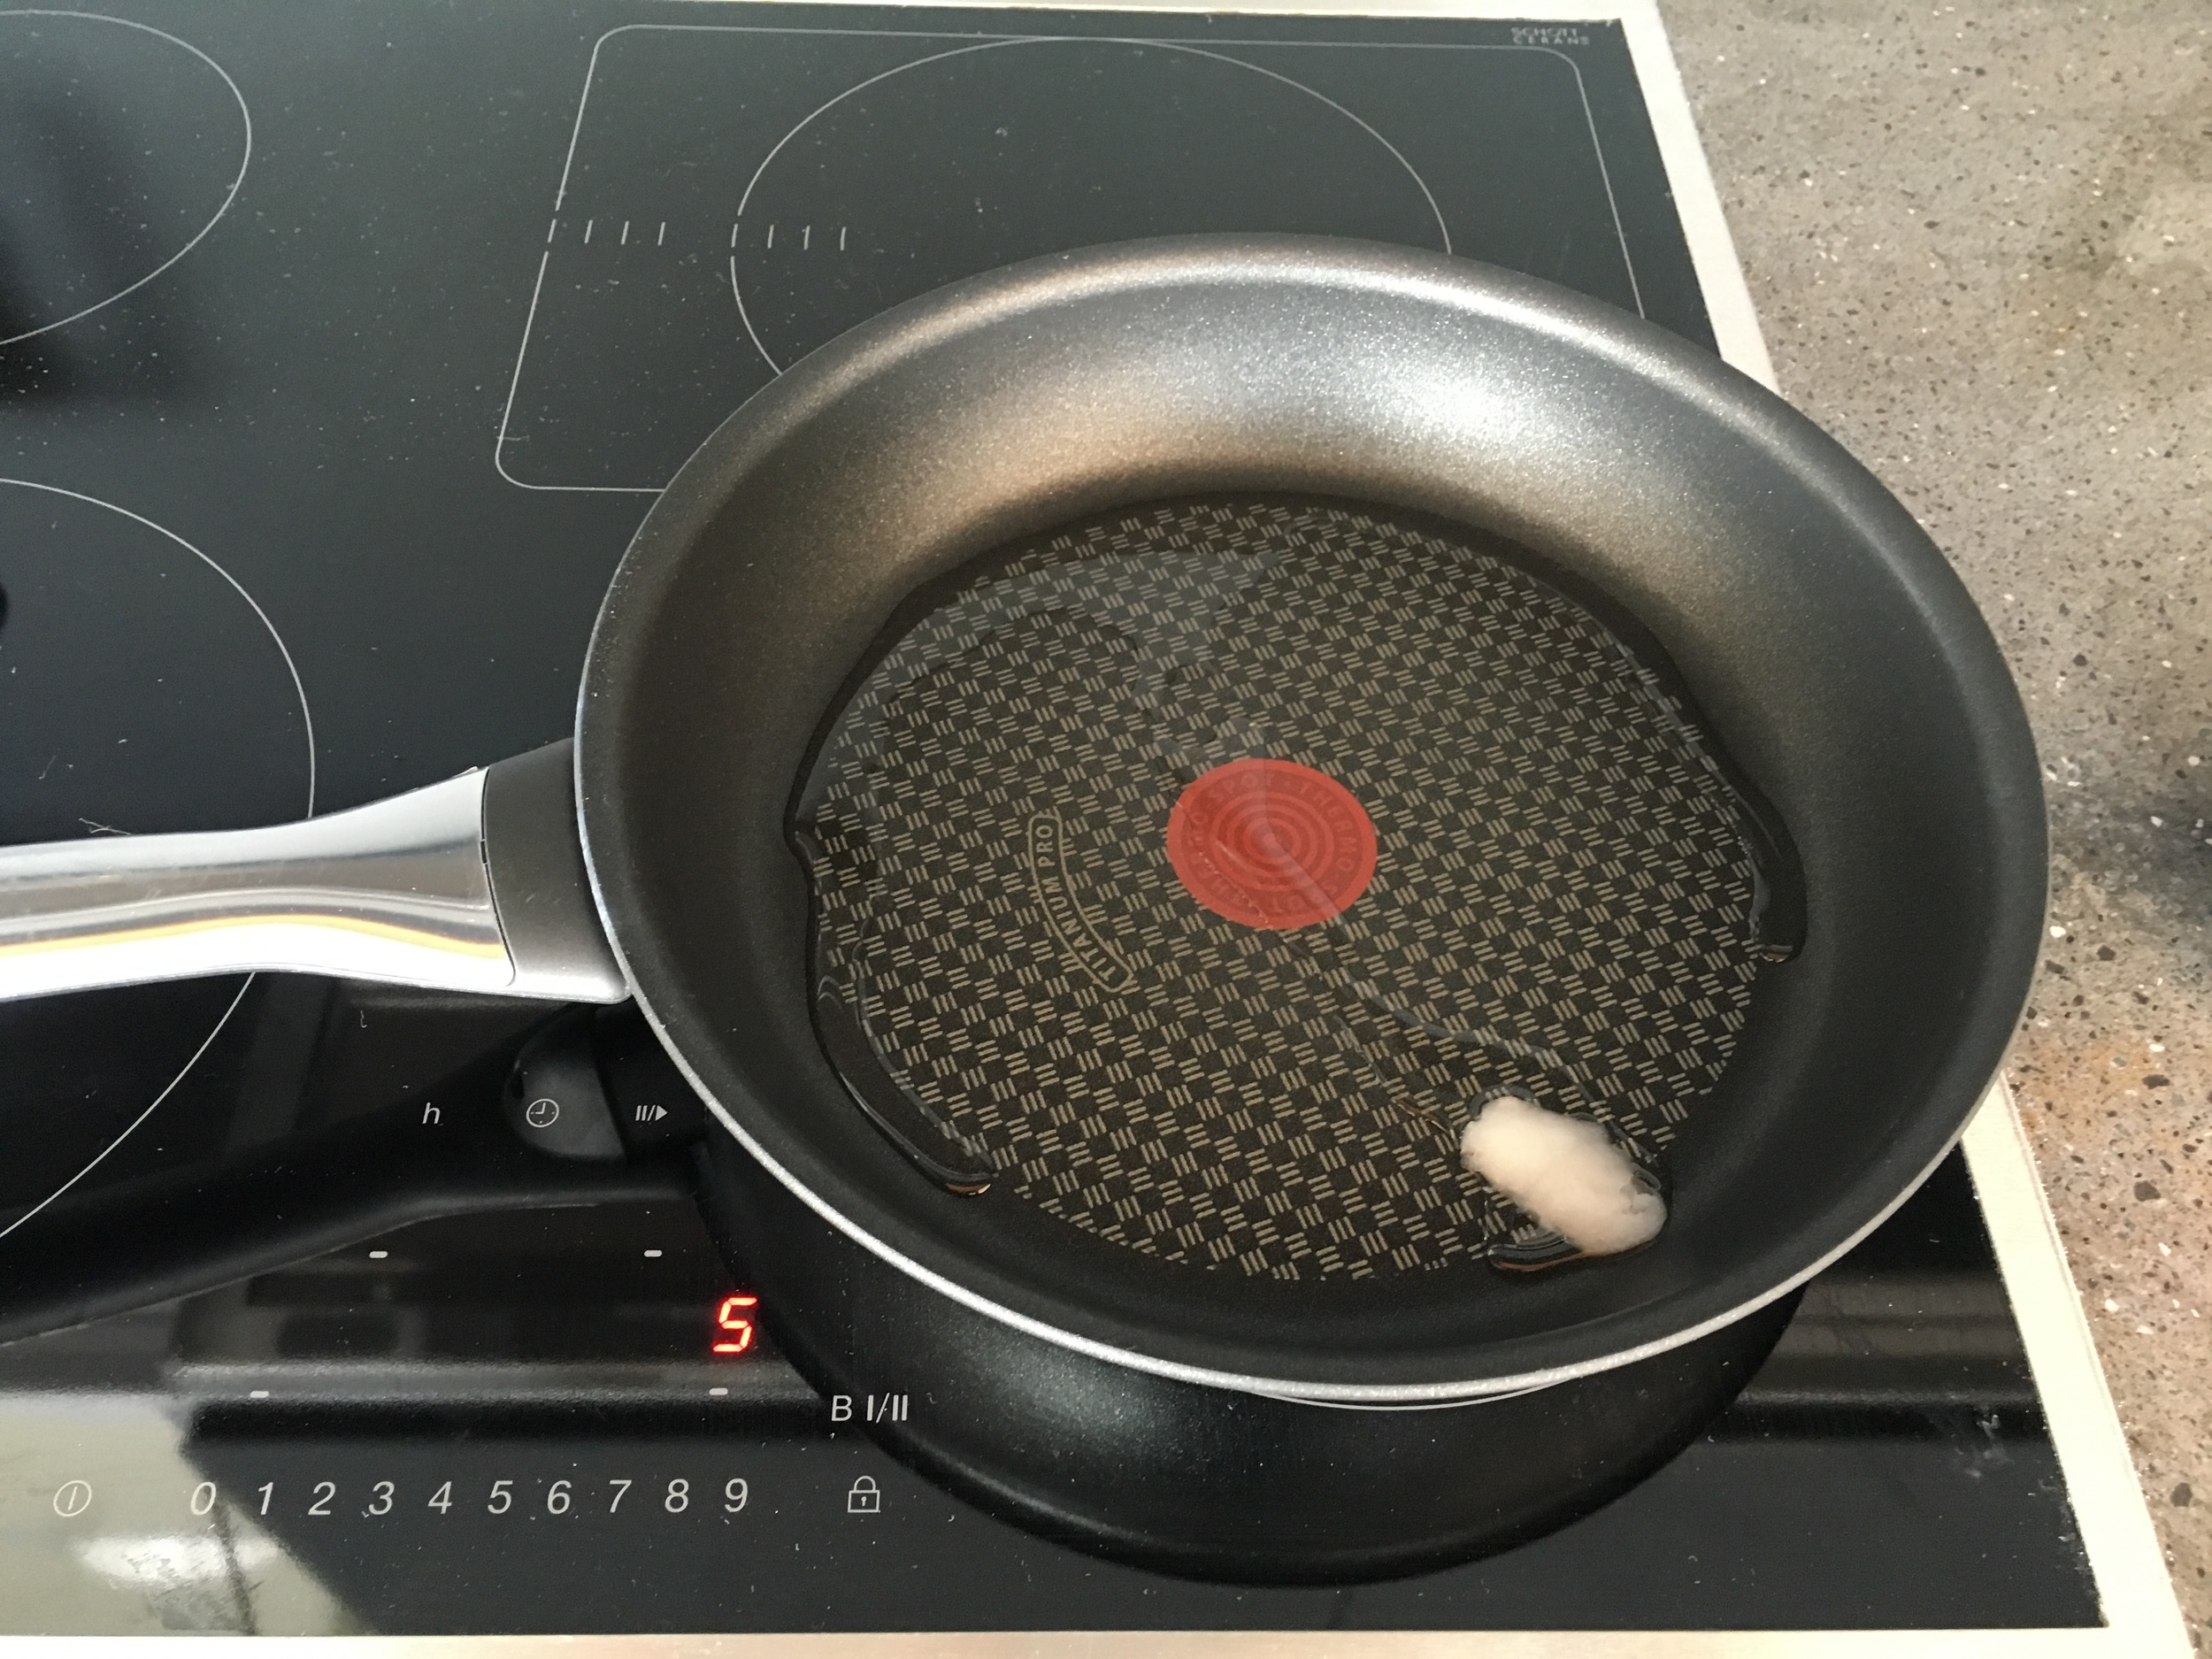 Step 1: Begin heating pan and coconut oil on medium heat